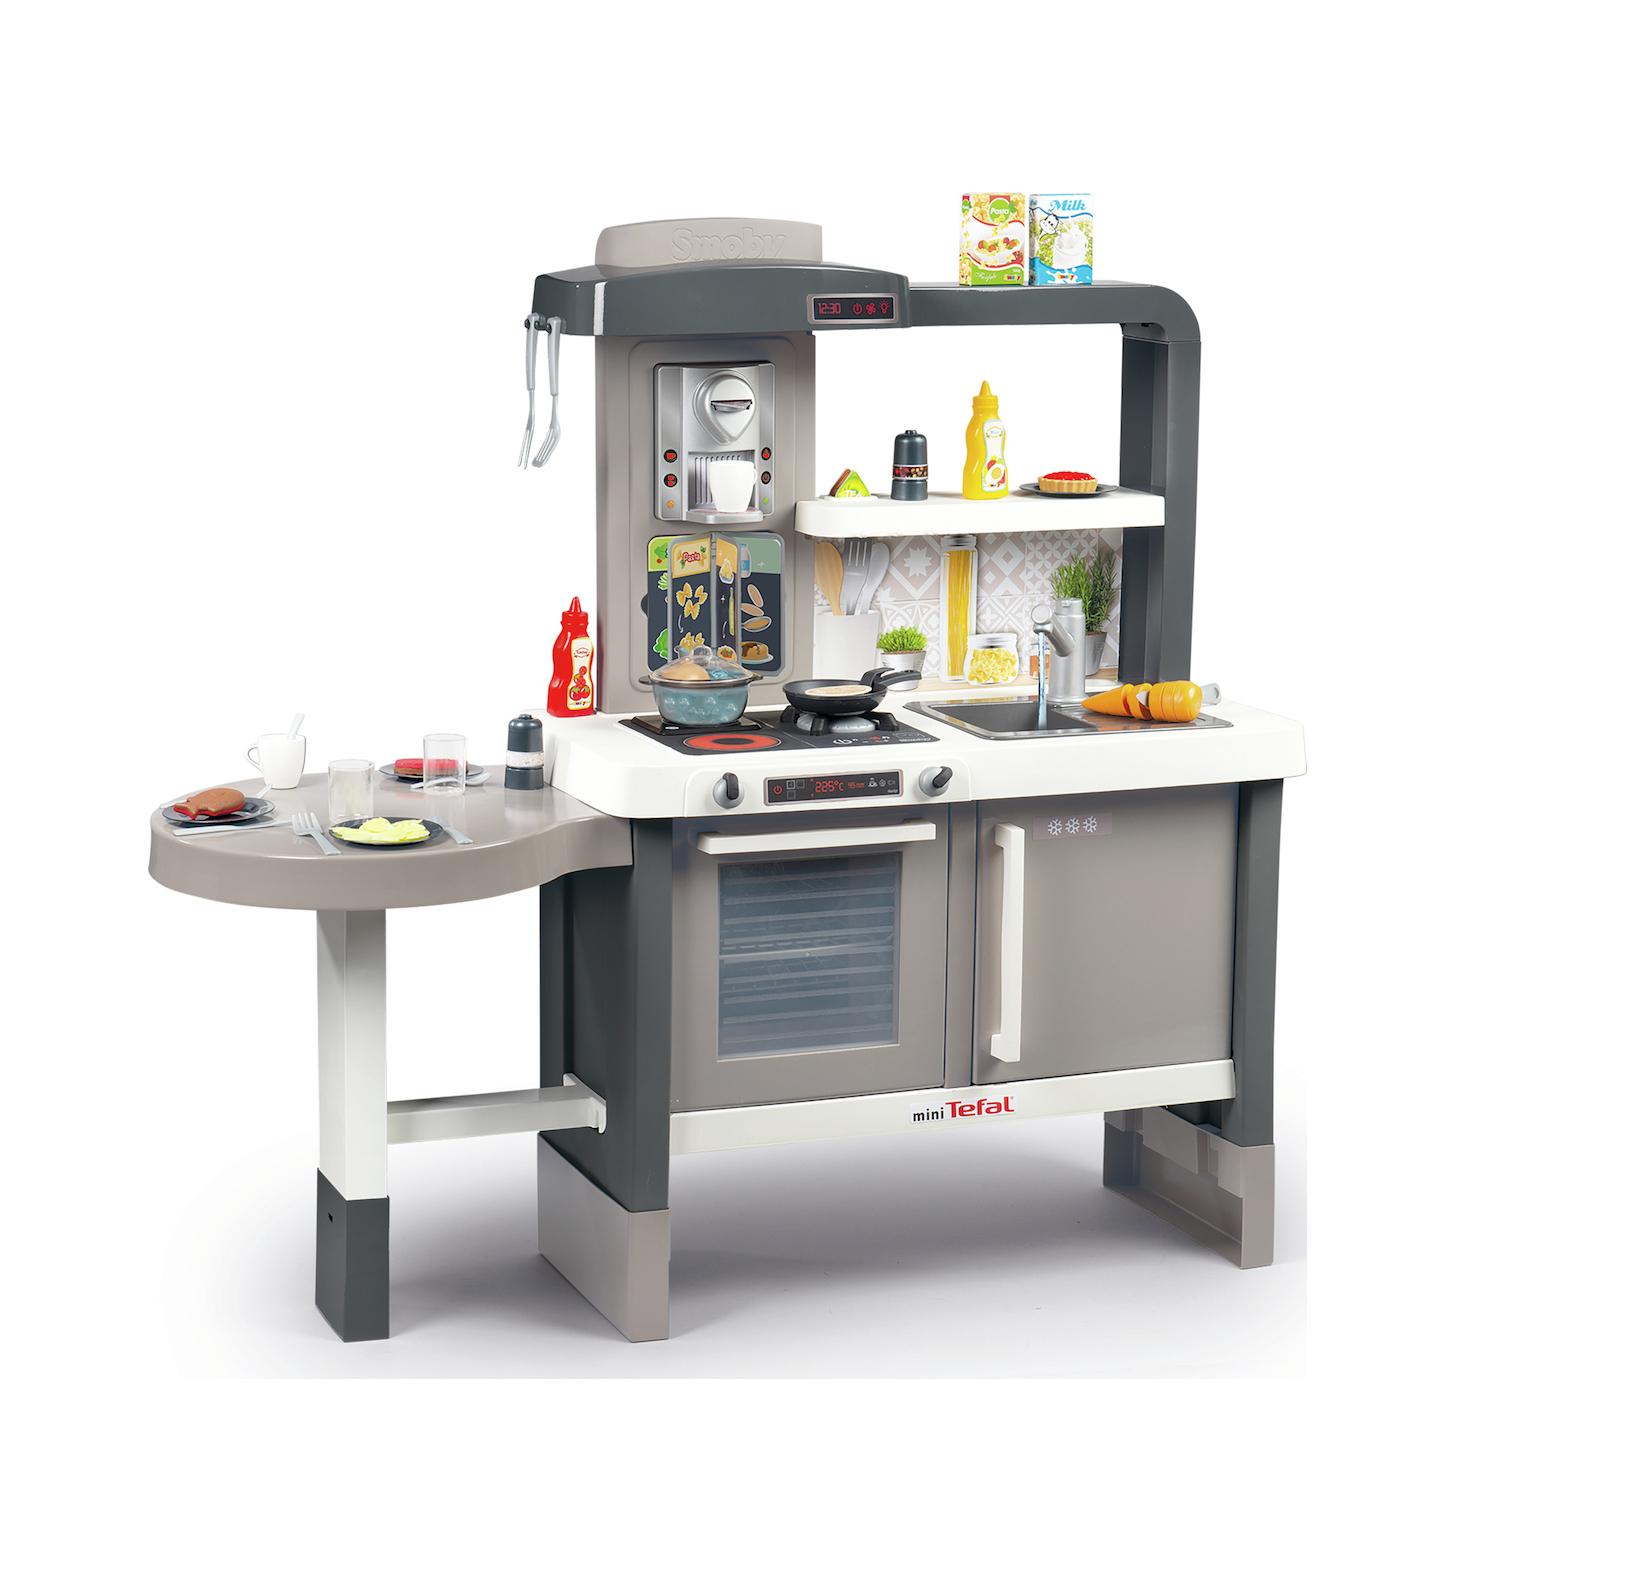 Smoby Tefal Evo kitchen, play kitchen 7600312300